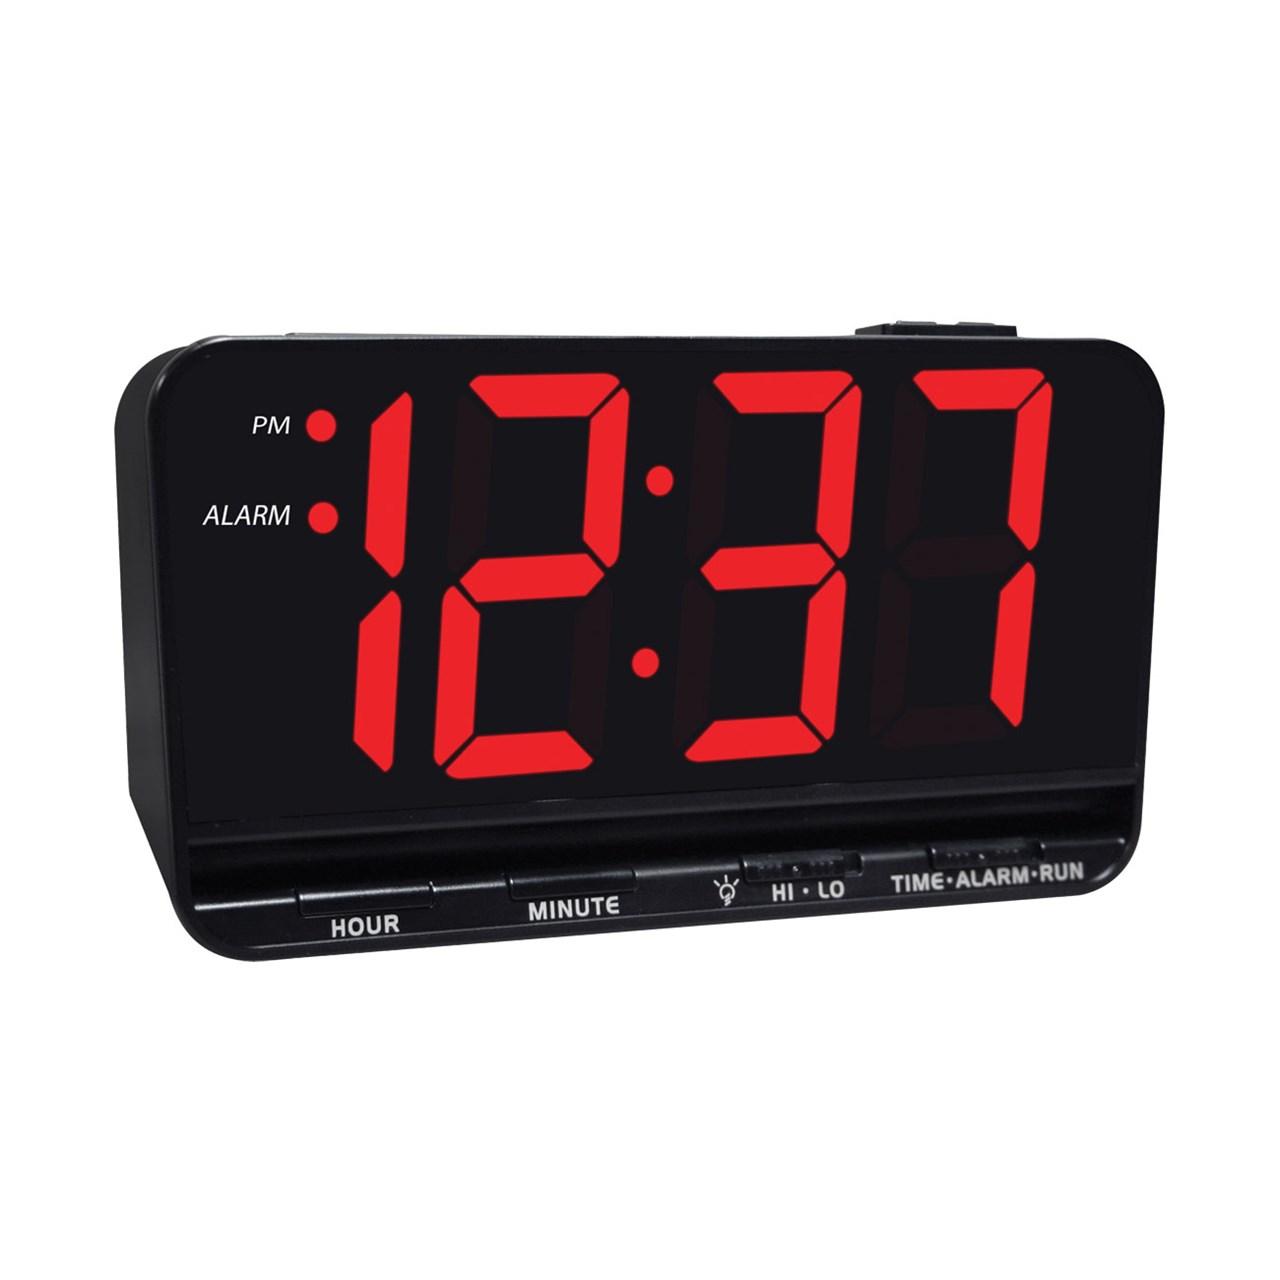 Maxiaids Jumbo Display Digital Alarm Clock With 3 Inch Led